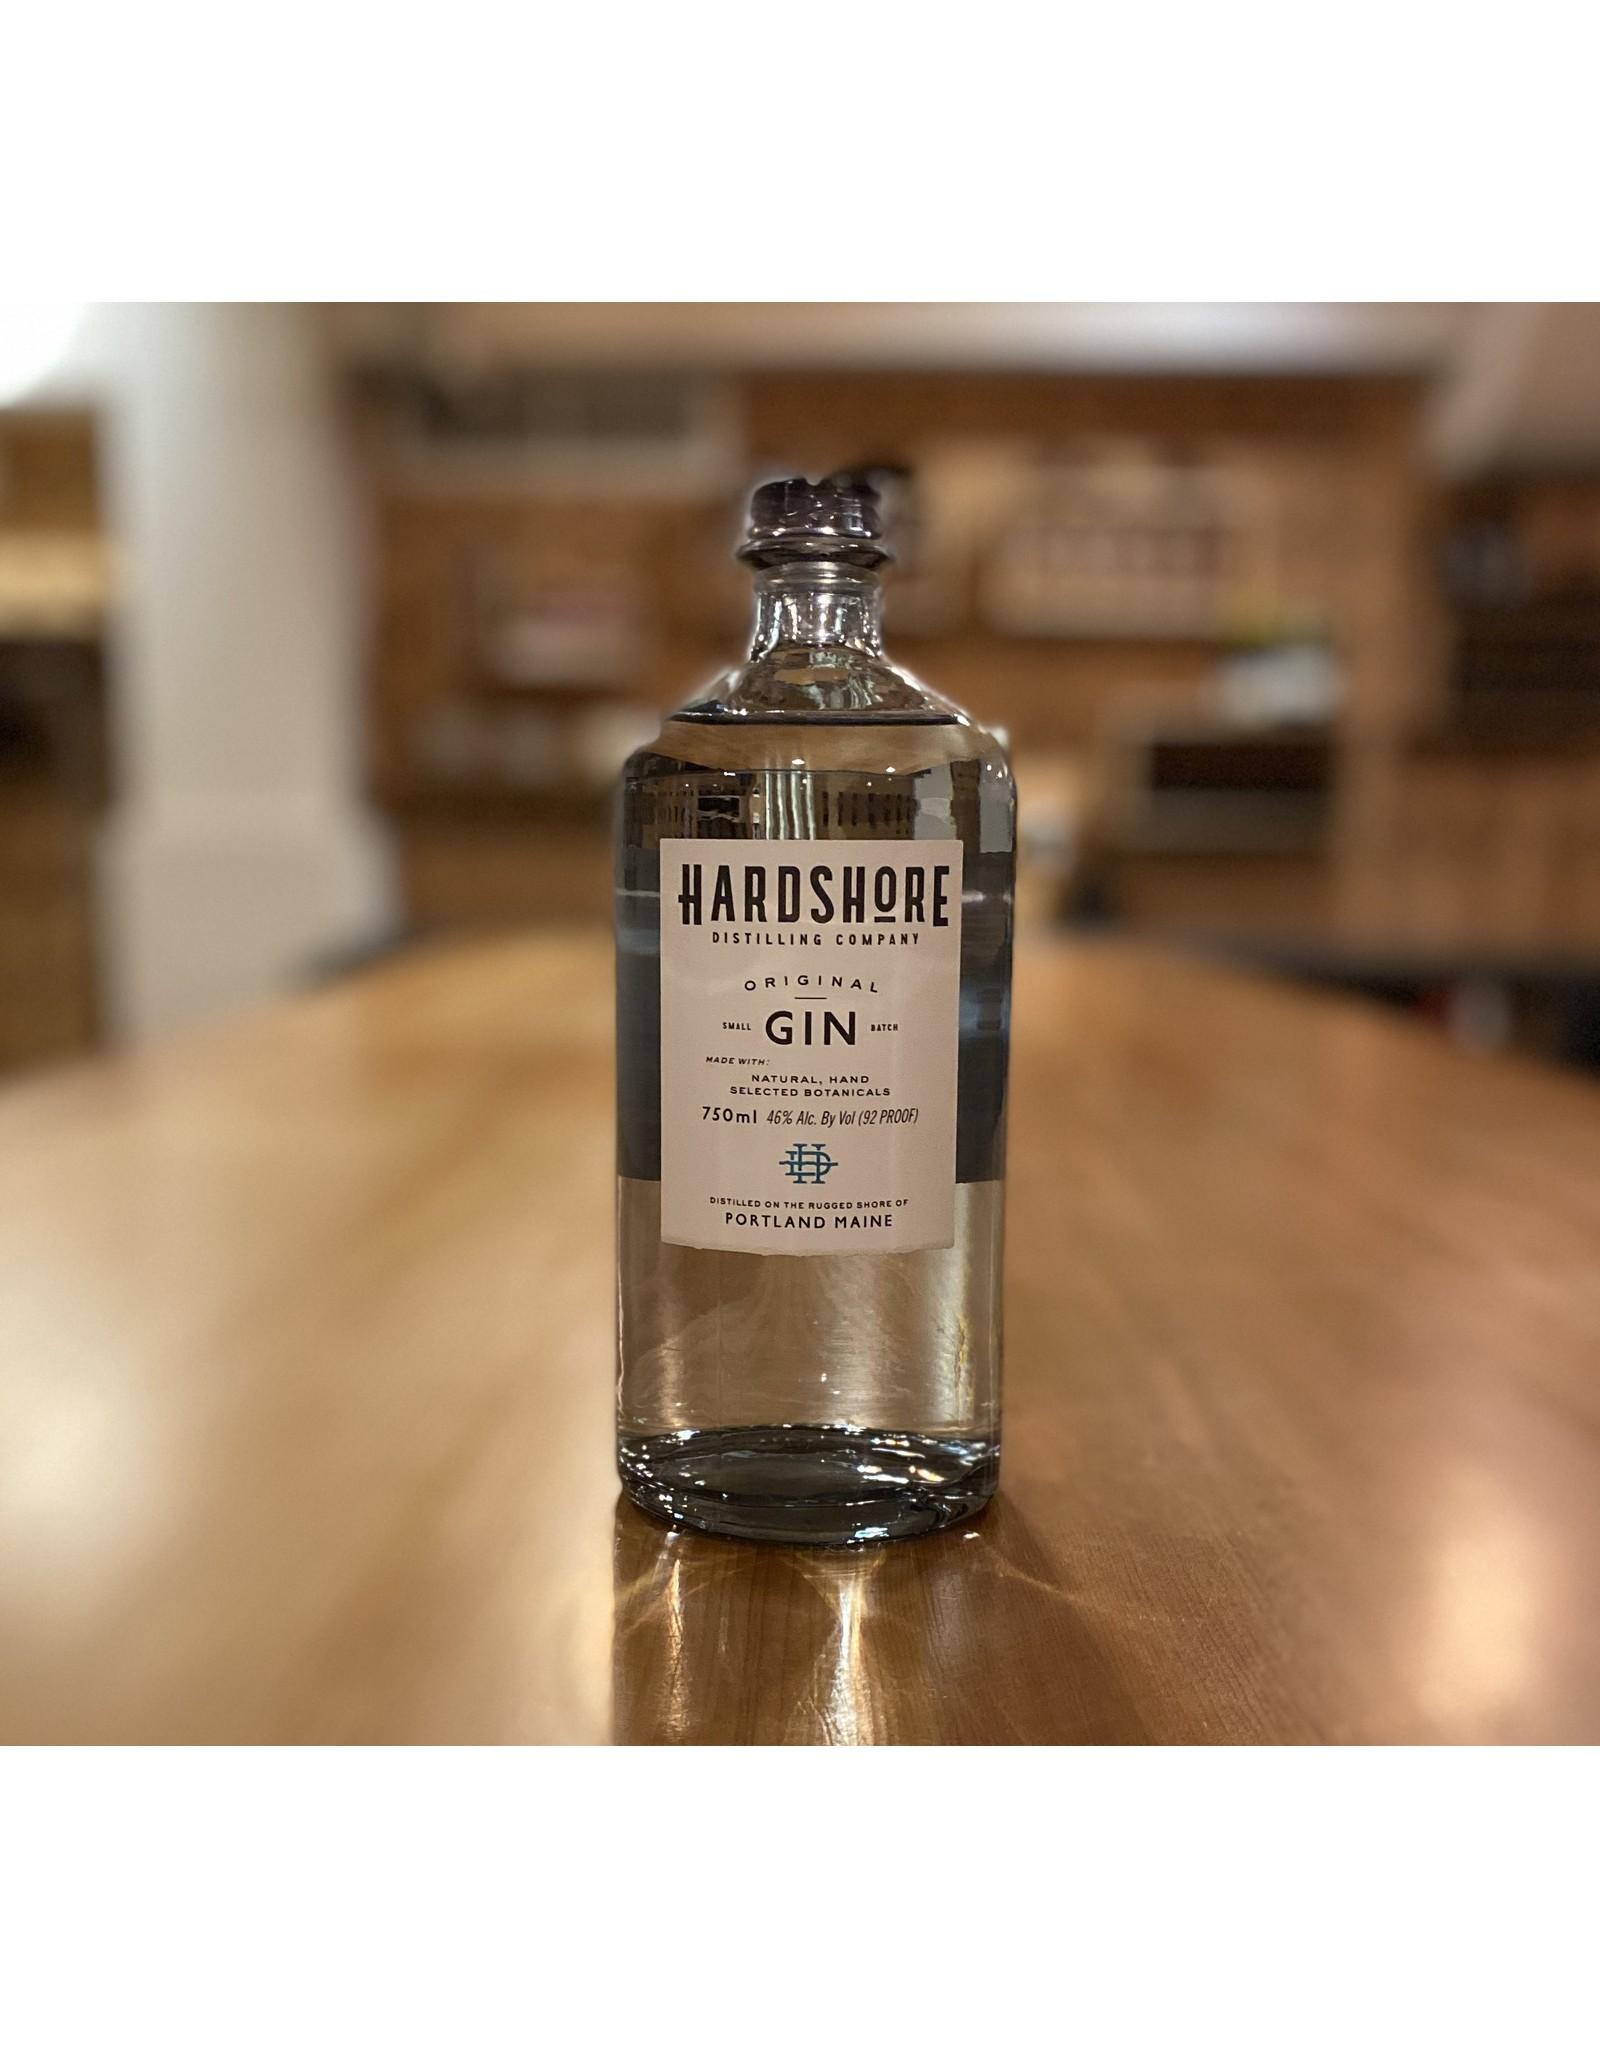 Gin Hardshore Original Gin 750ml